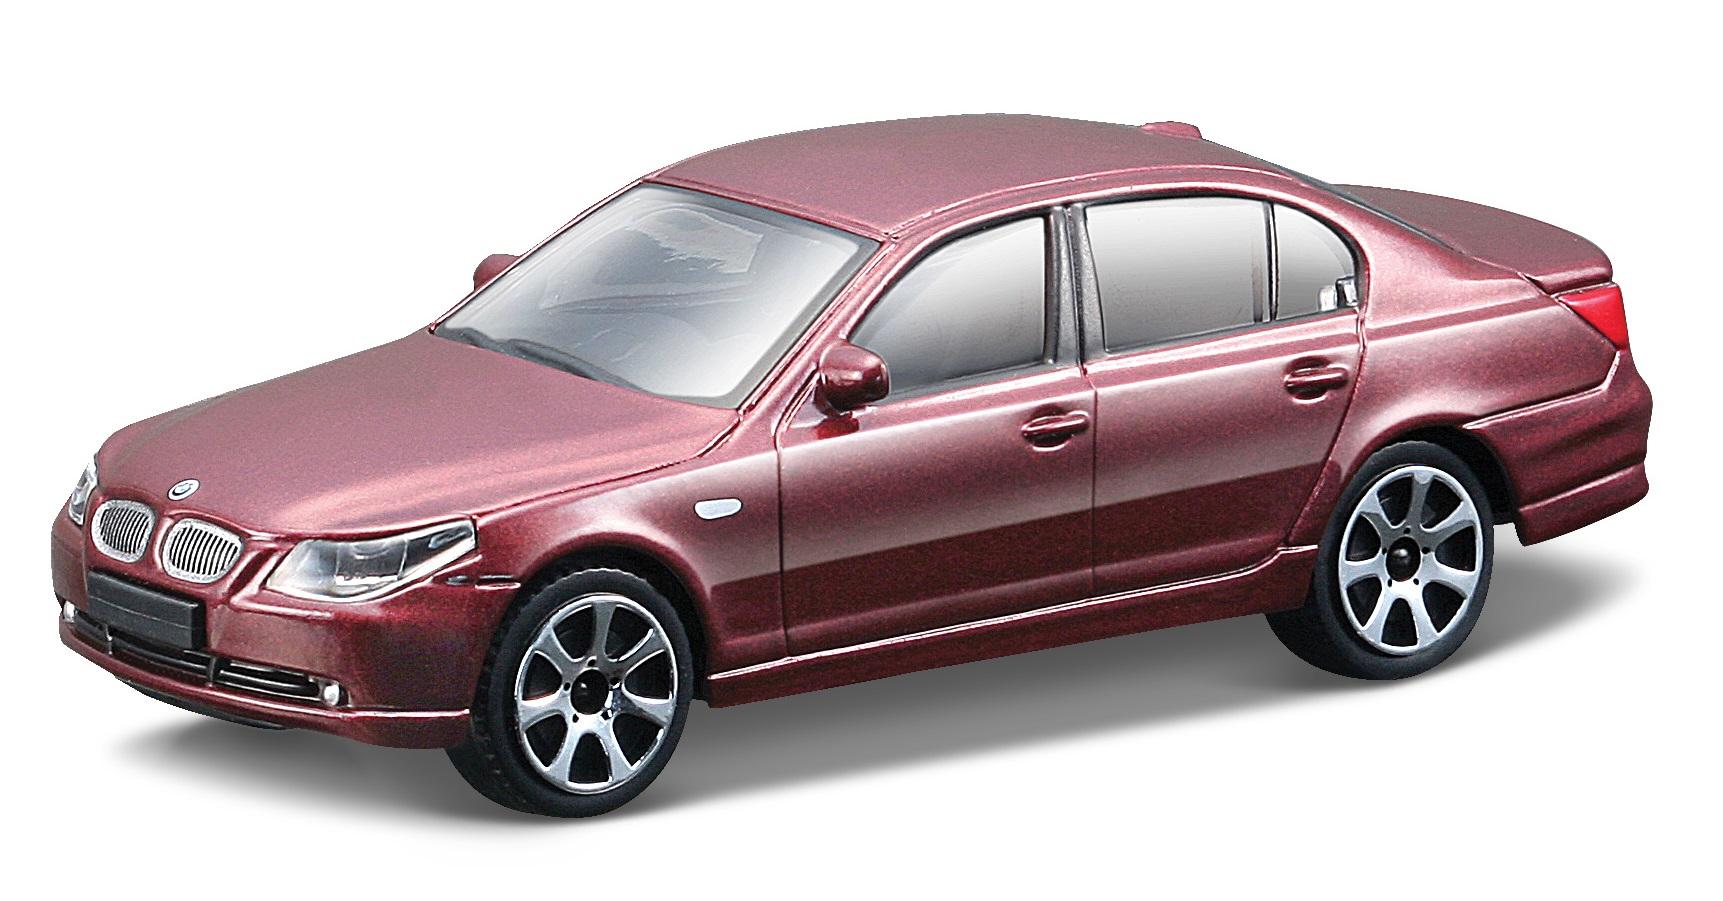 BMW 545I 2009 Scale 1:43 (Metallic Red/Vermelho Metálico)